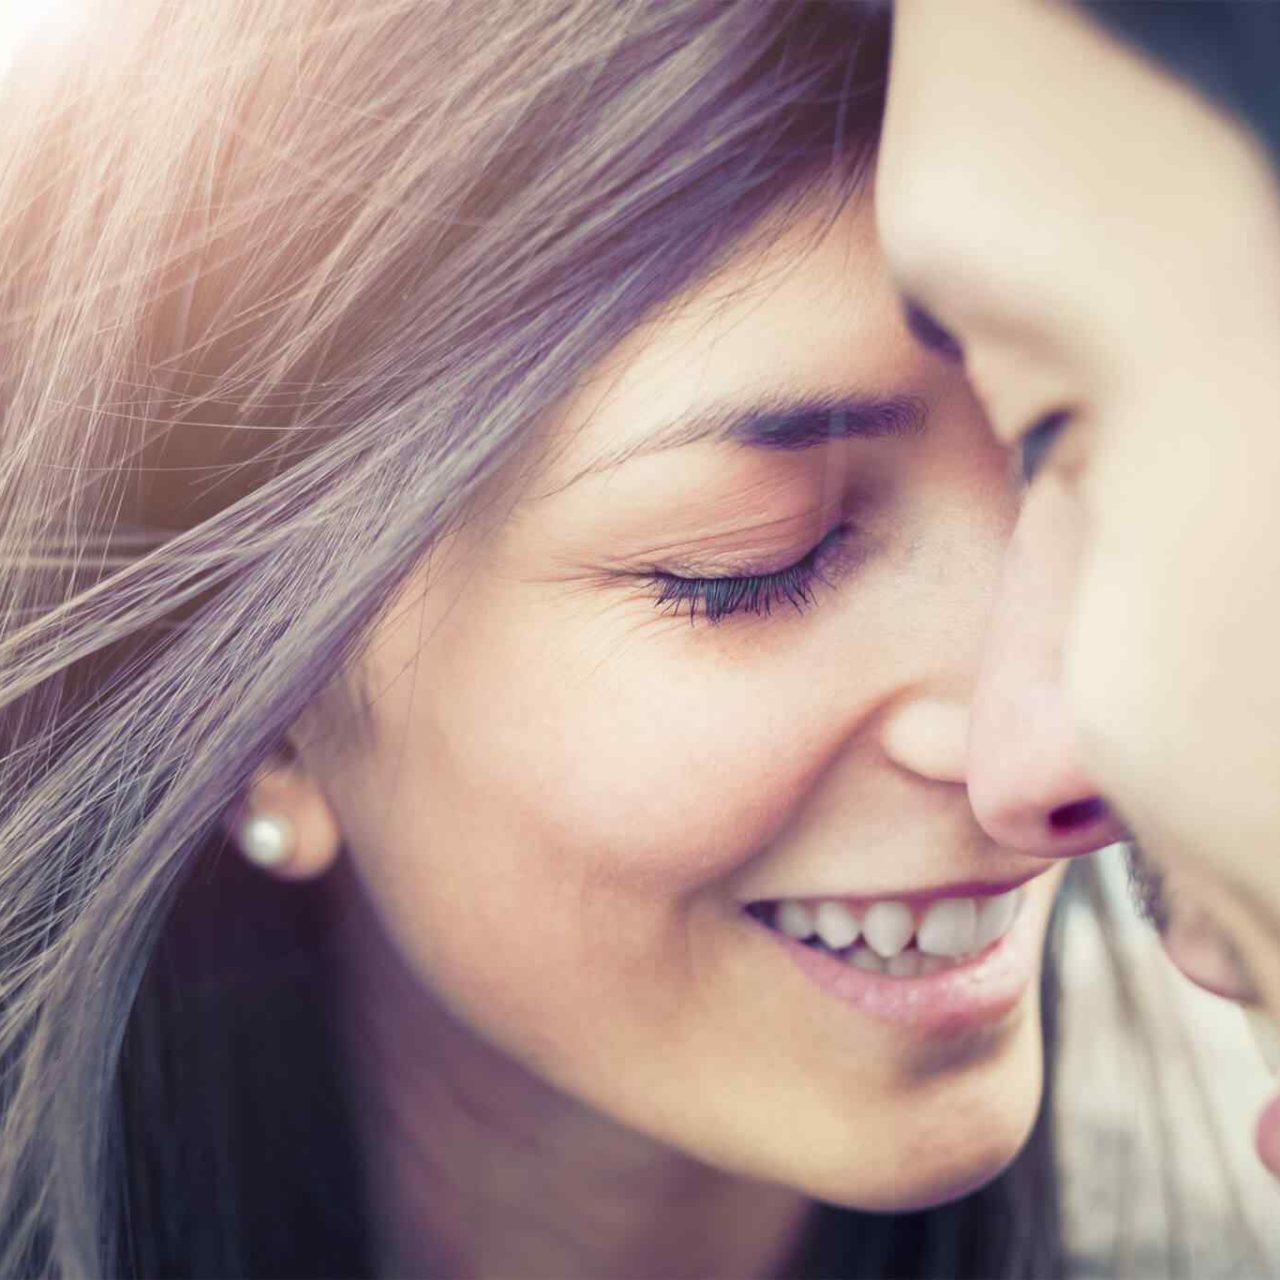 https://www.razvan-popa.ro/wp-content/uploads/2018/01/img-class-marriage-01-1280x1280.jpg